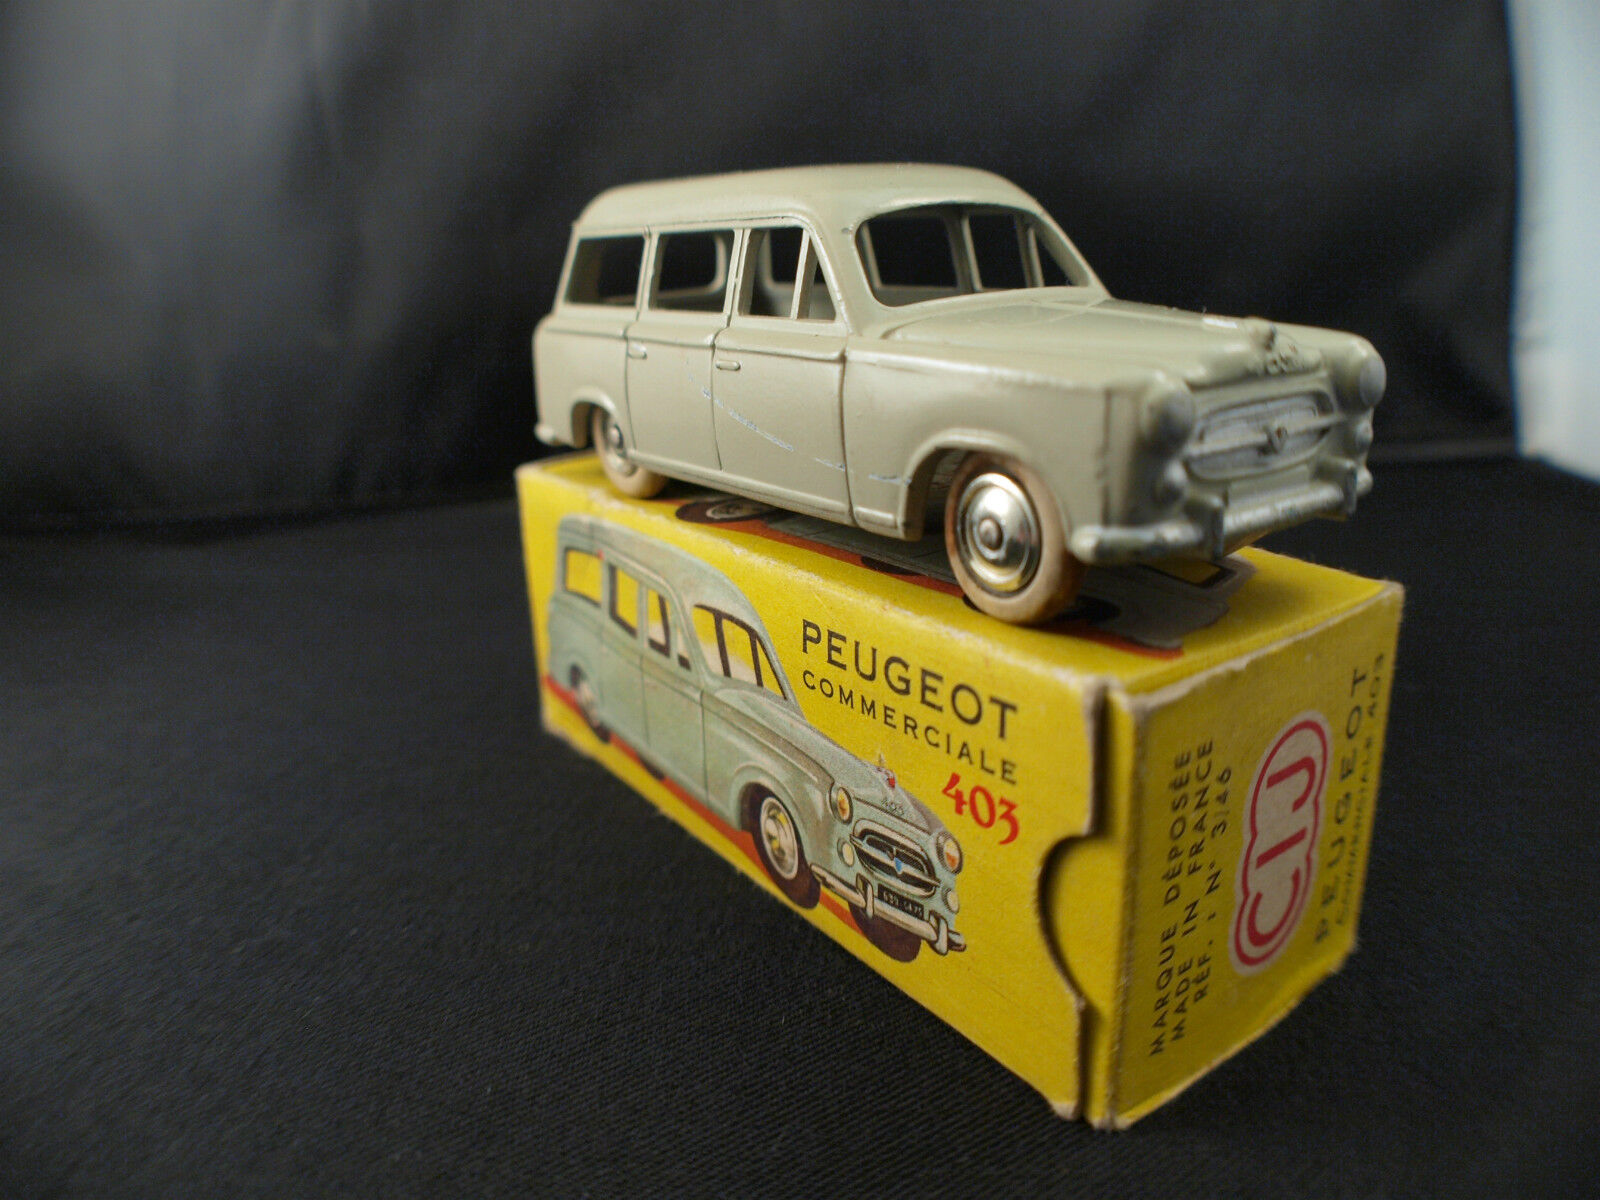 Cij Francia 3 46 Peugeot 403 Premi commerciale;re Versione in scatola